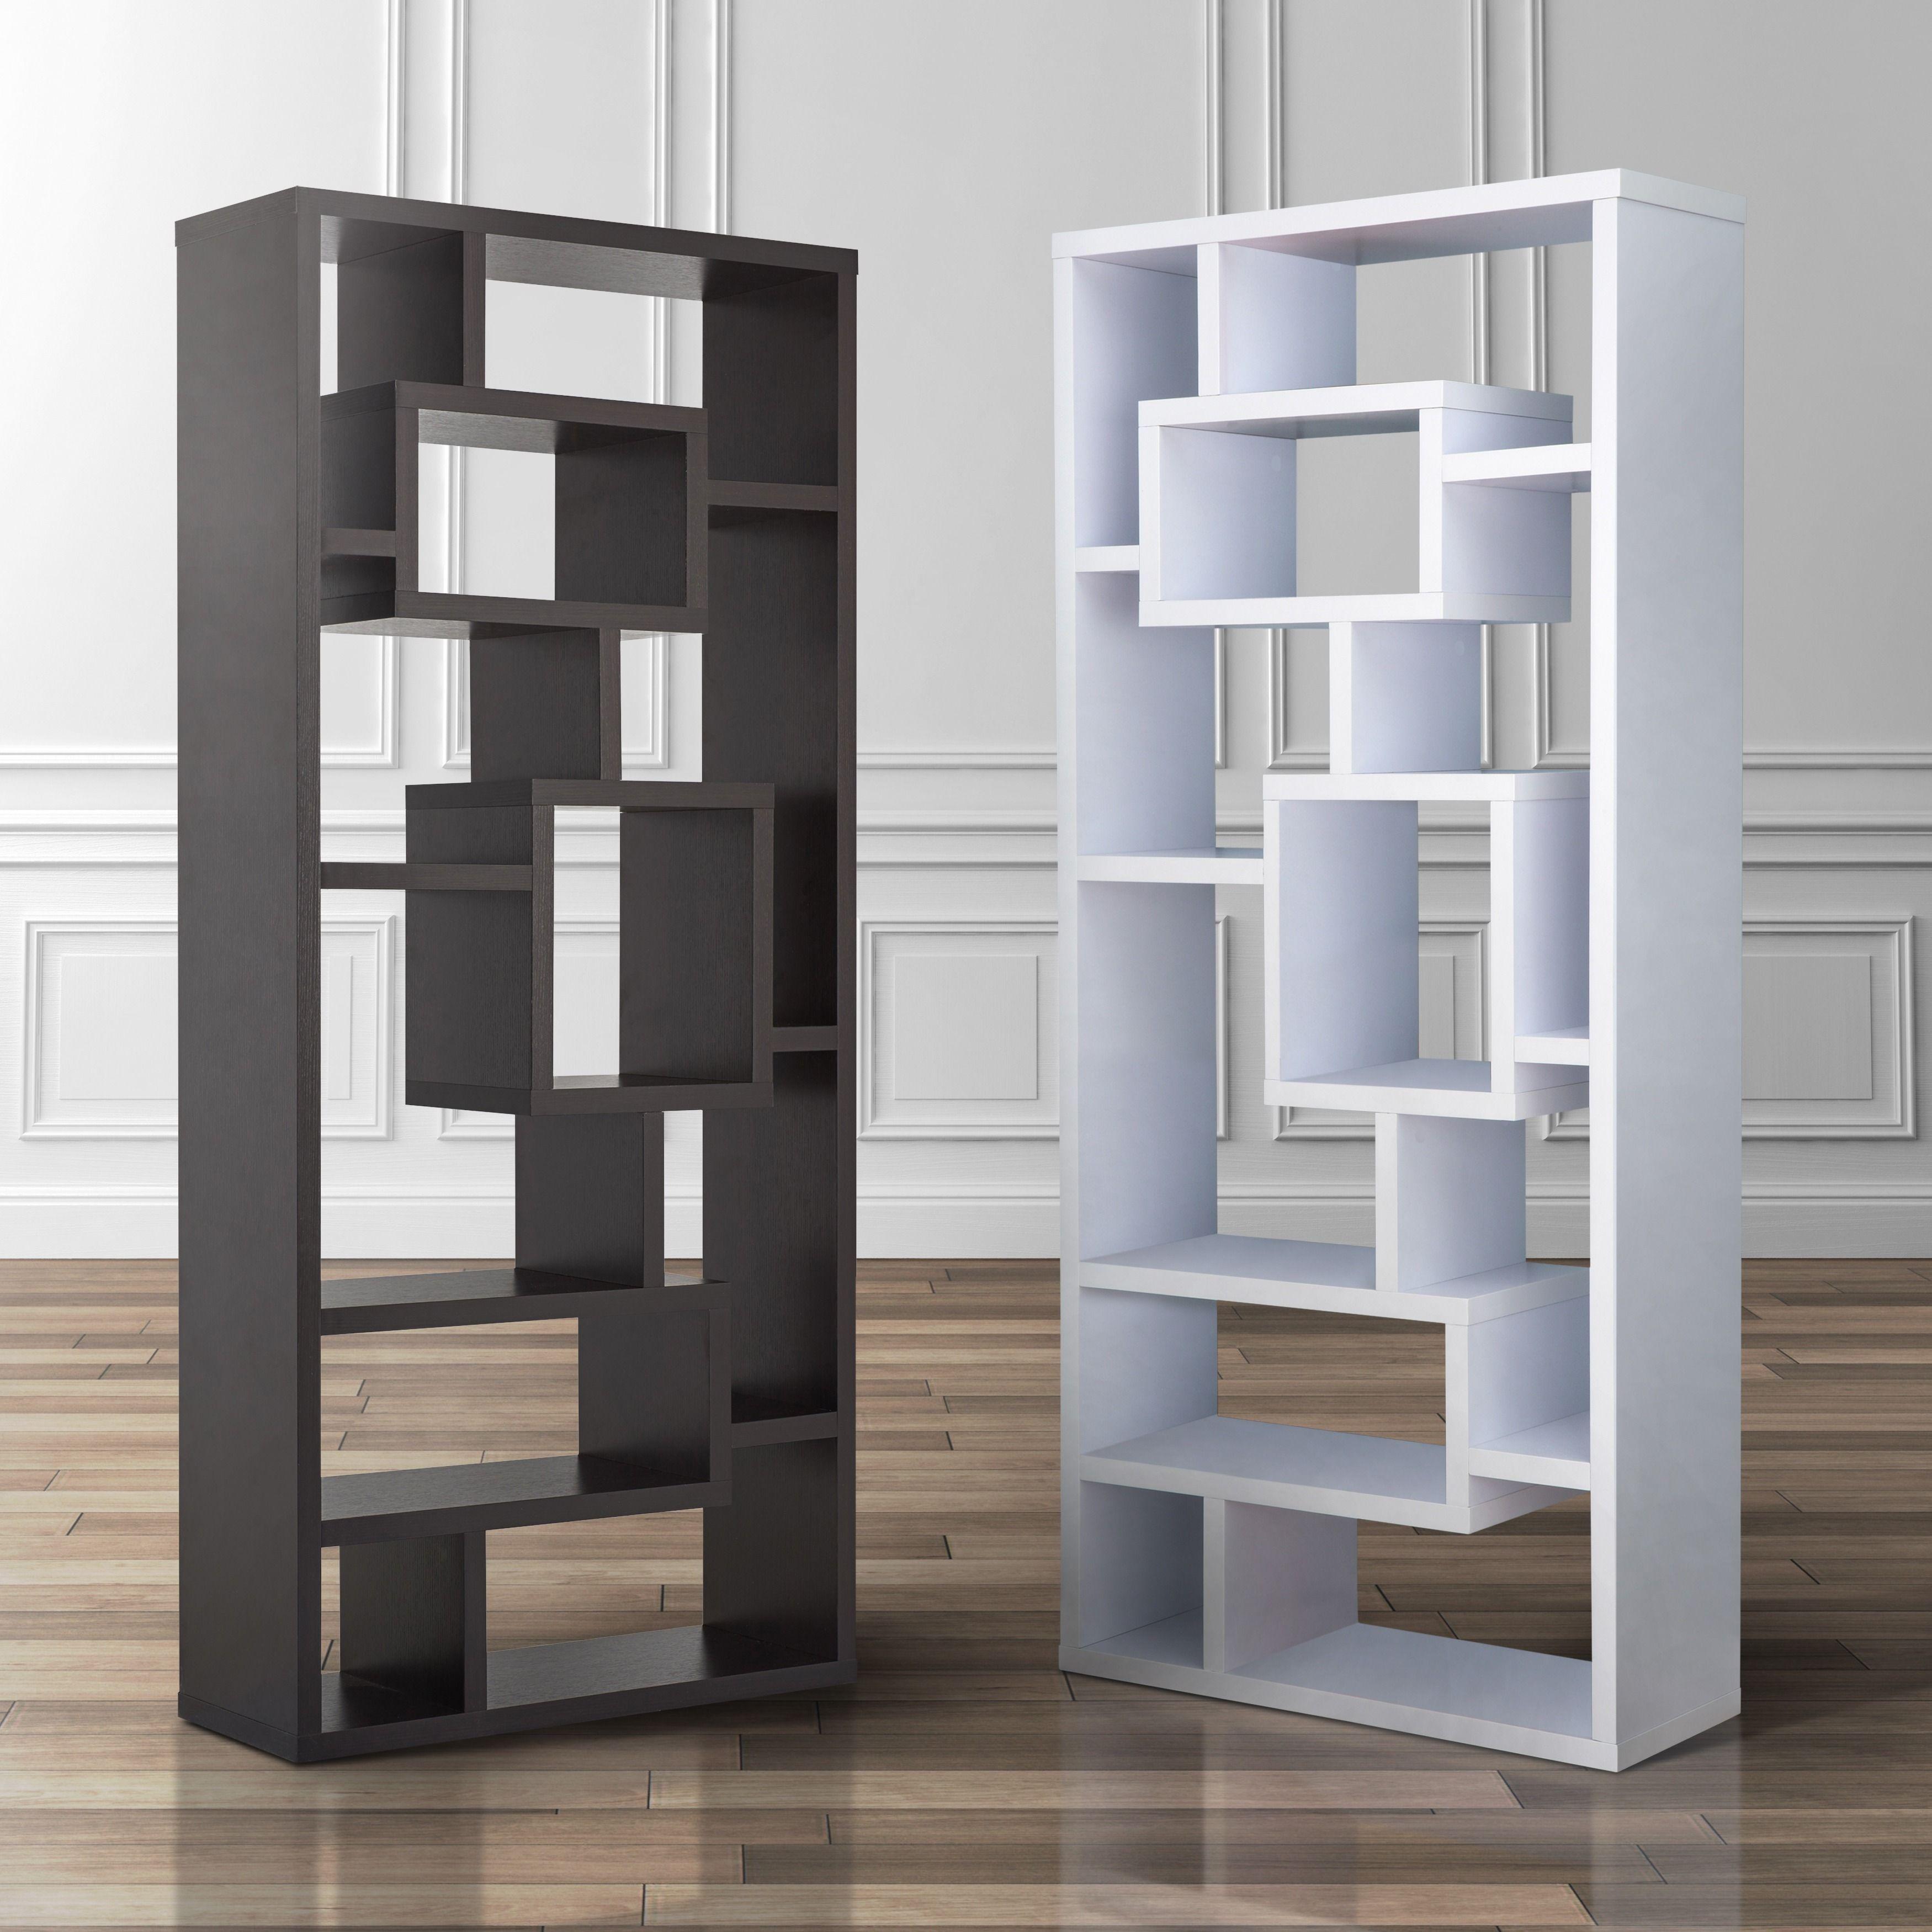 Furniture Of America Tribeca Bookcase/ Display Cabinet